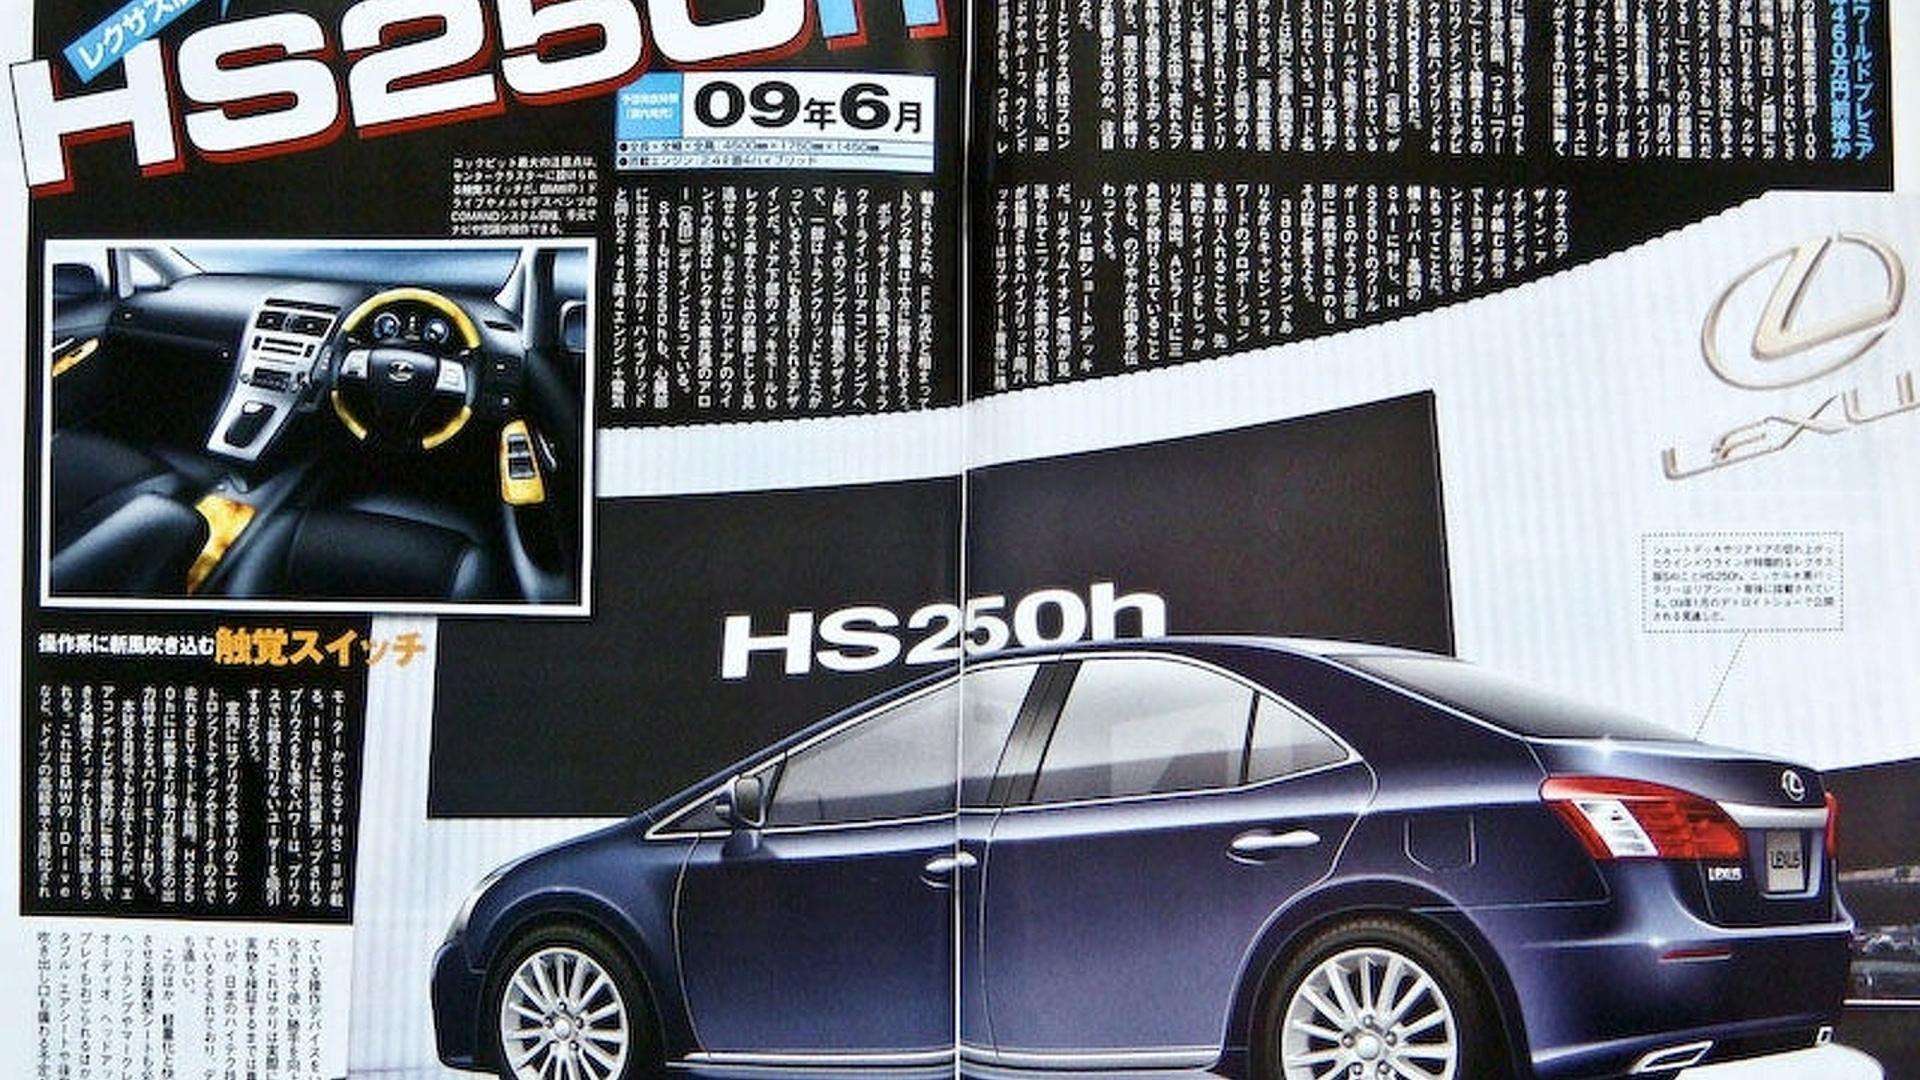 Rendered Speculation: Lexus HS250h Dedicated Hybrid Model